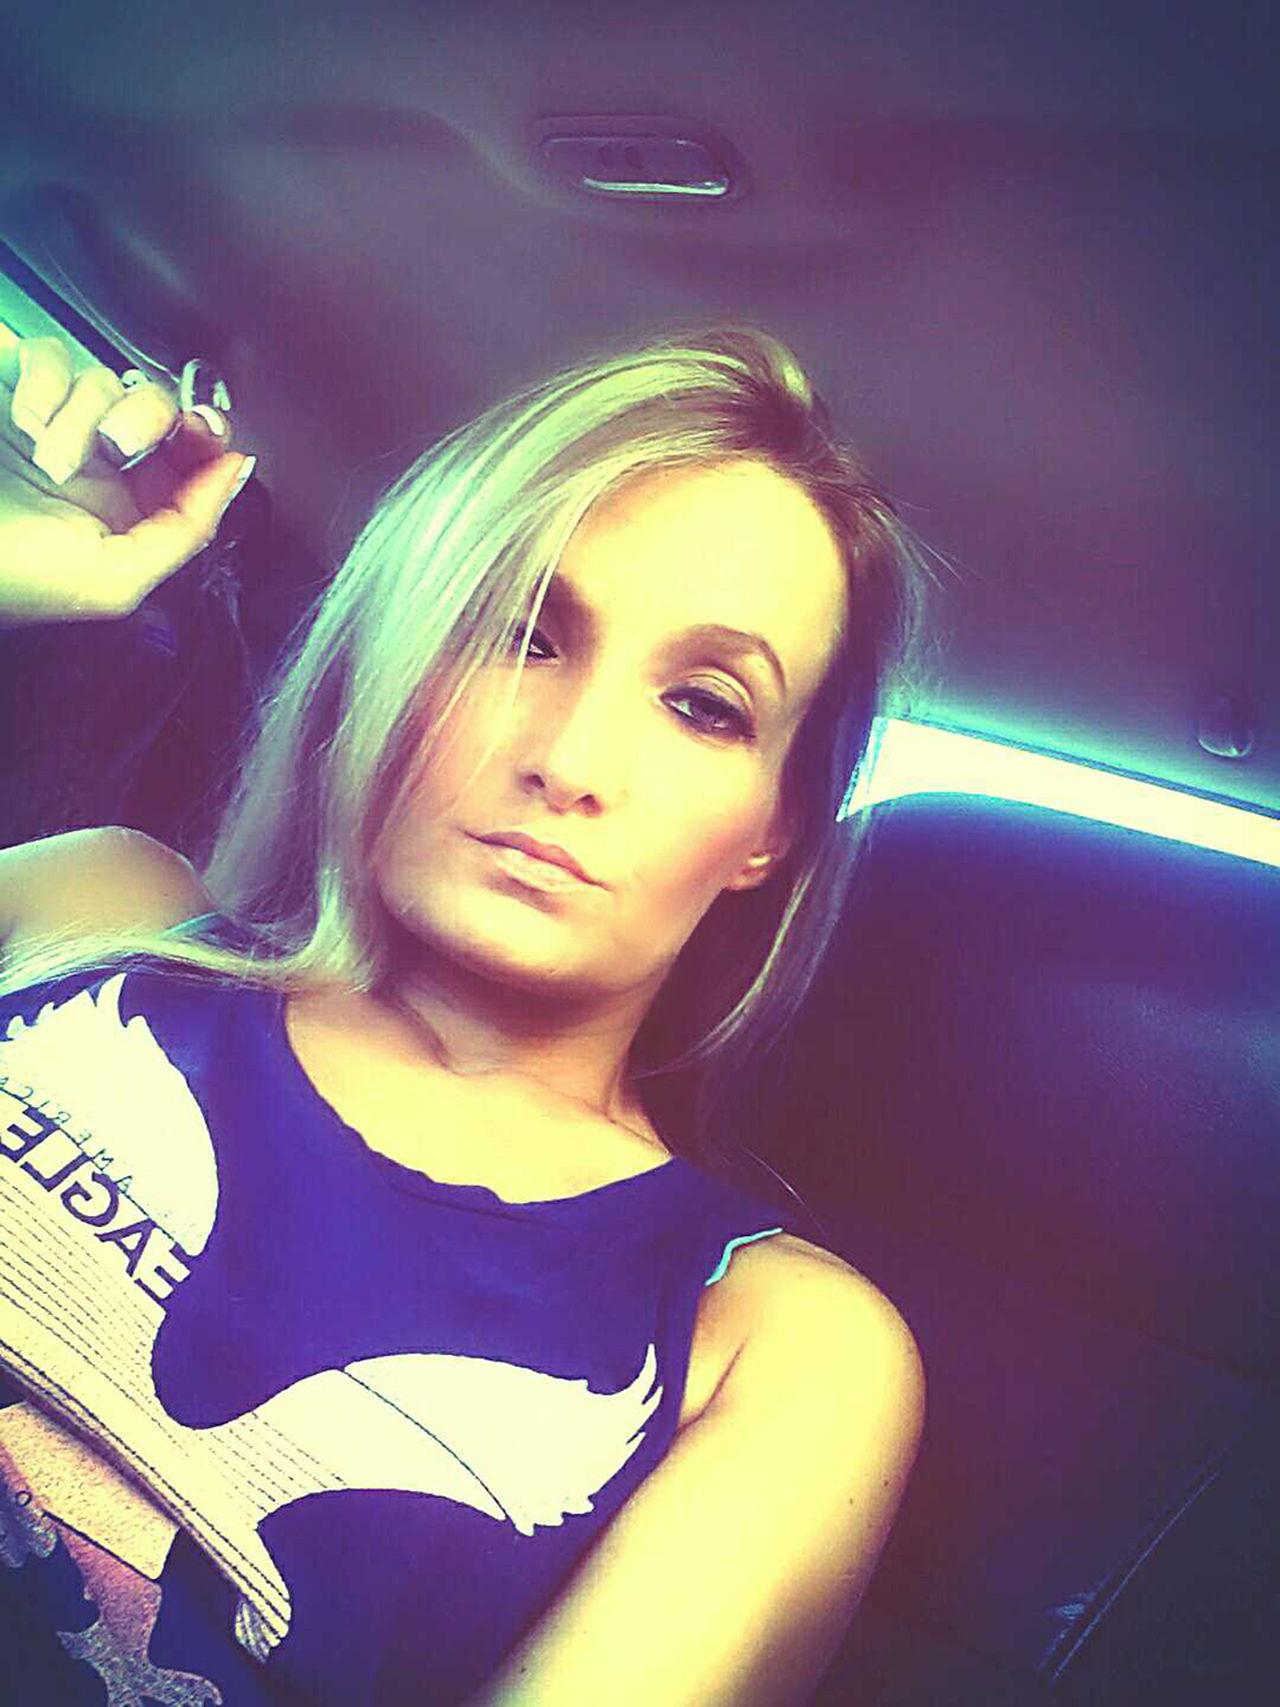 Seductive Hot_shotz Hotties Blue Eyes <3 Beauty Fuckmeeyes Let Your Hair Down Model Bedroomeyes Blonde SexyAsFuck